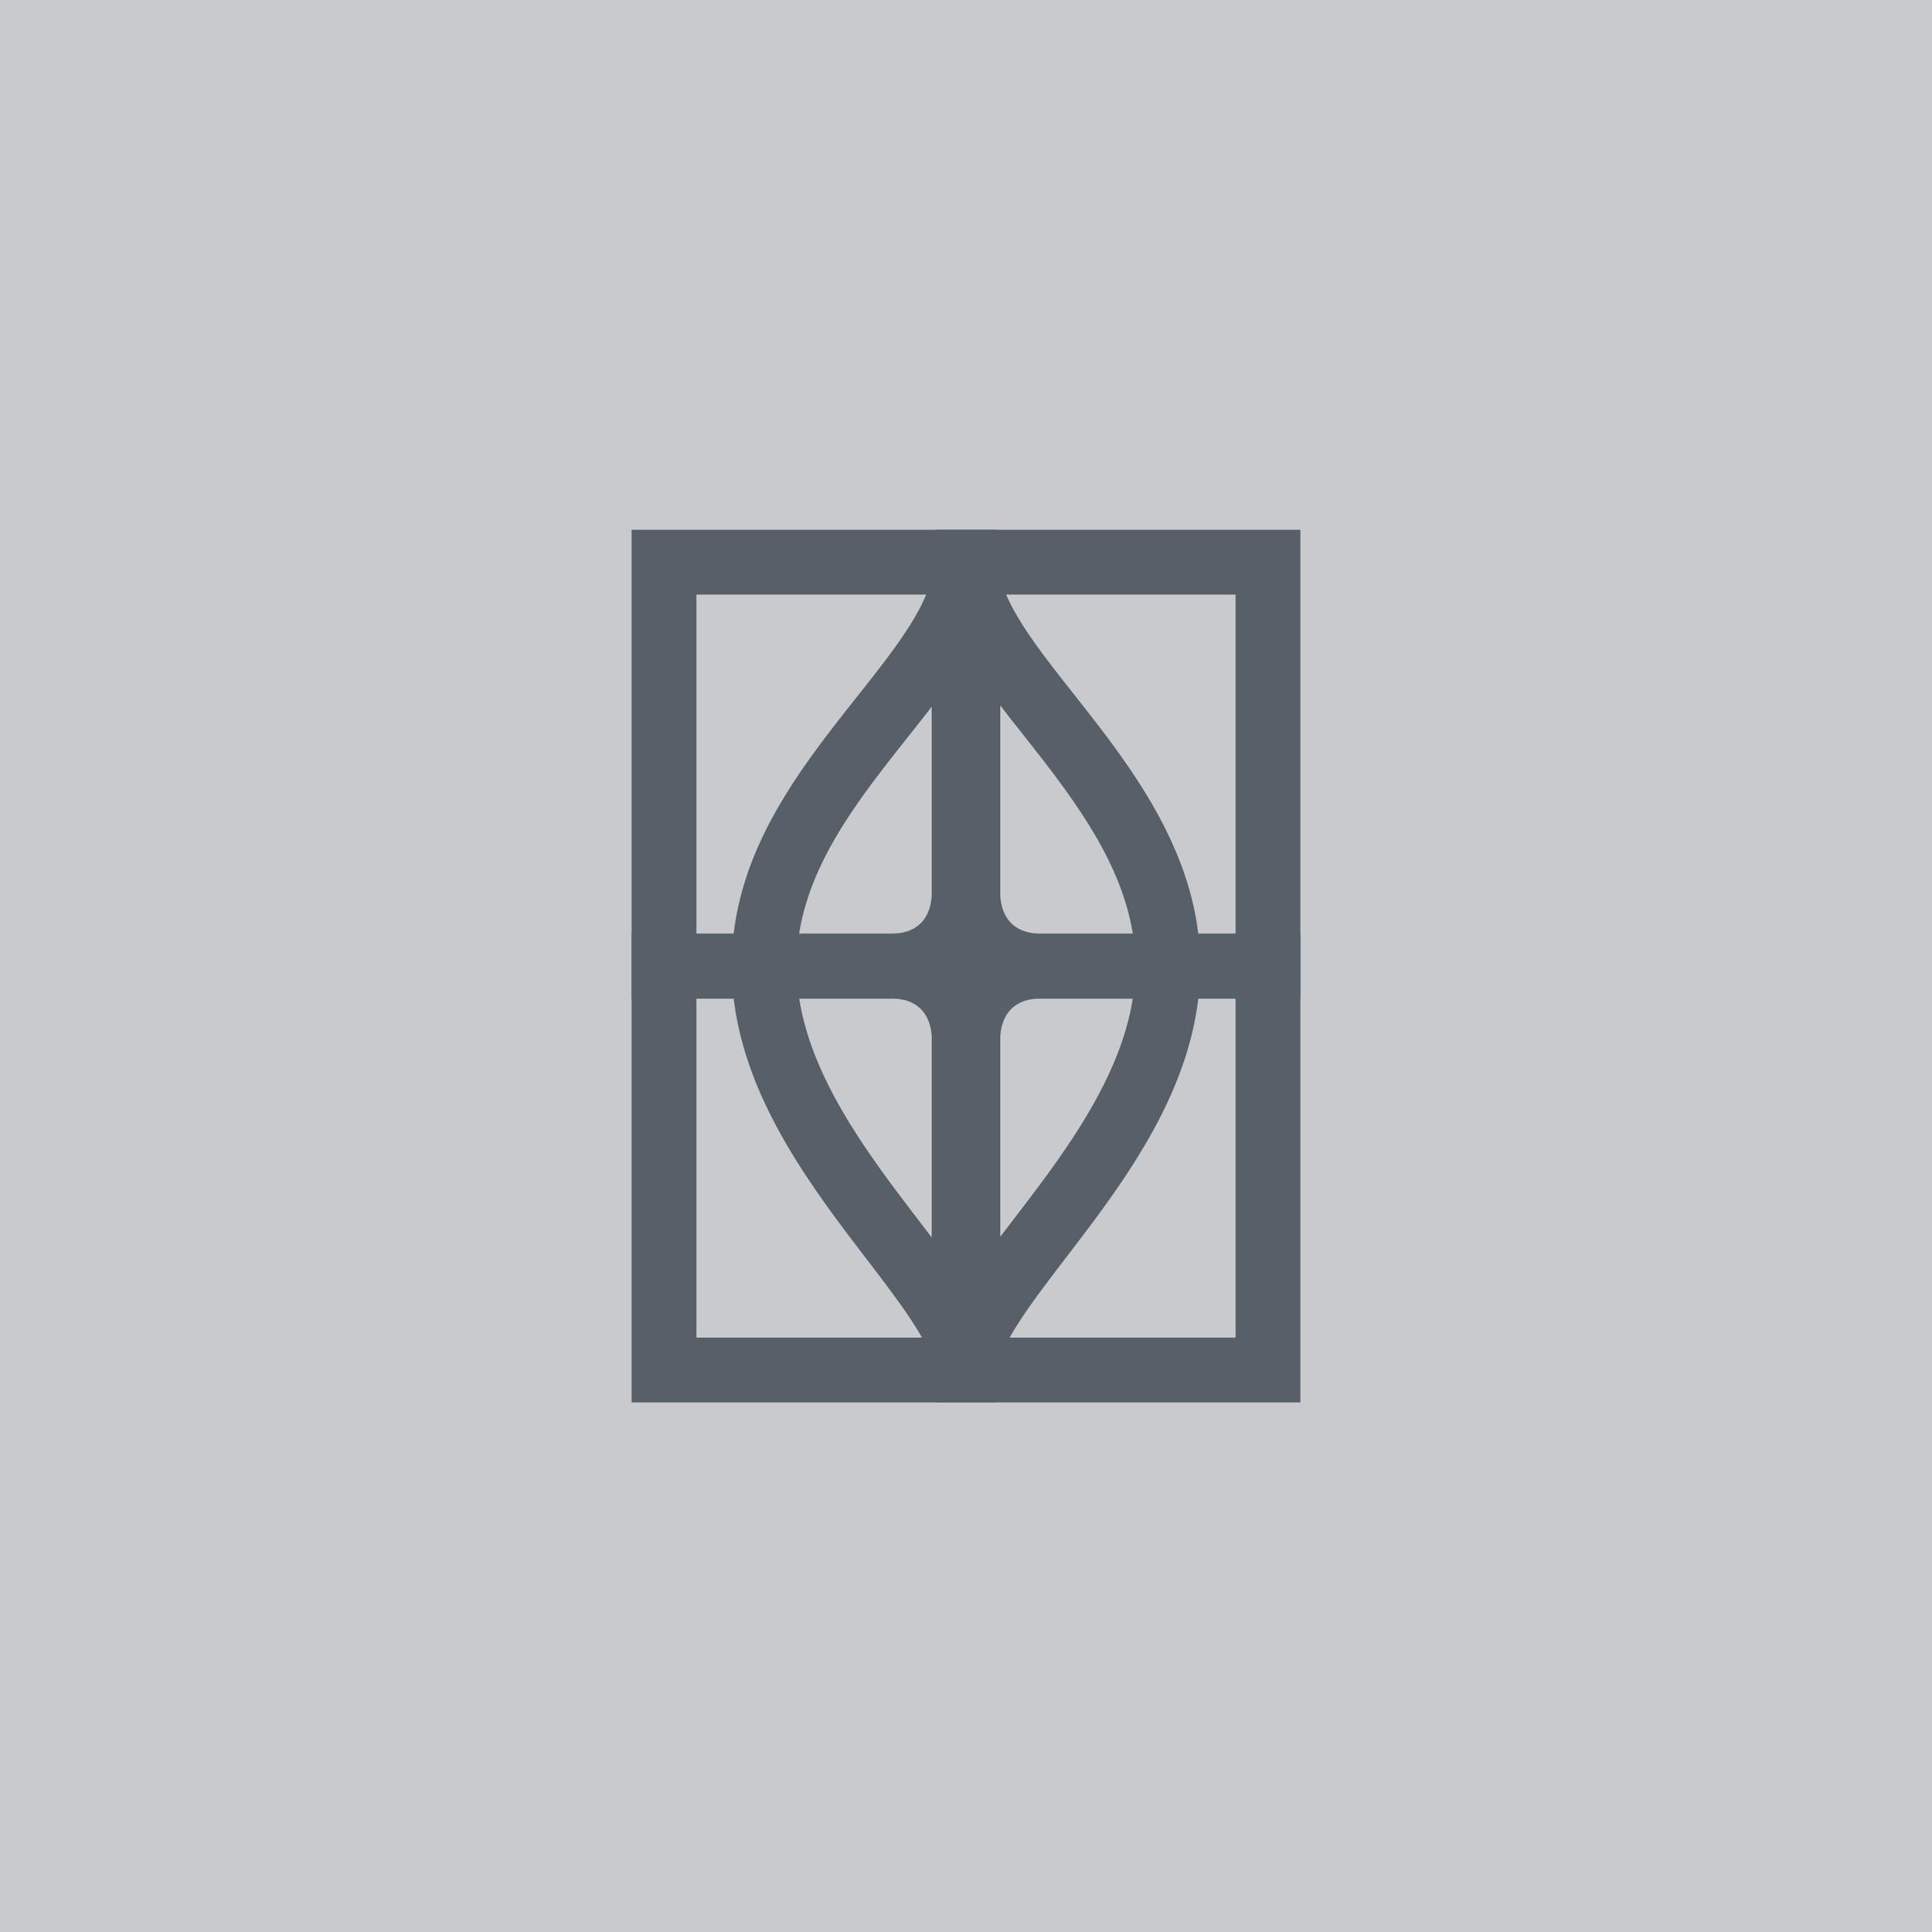 isaac symbols